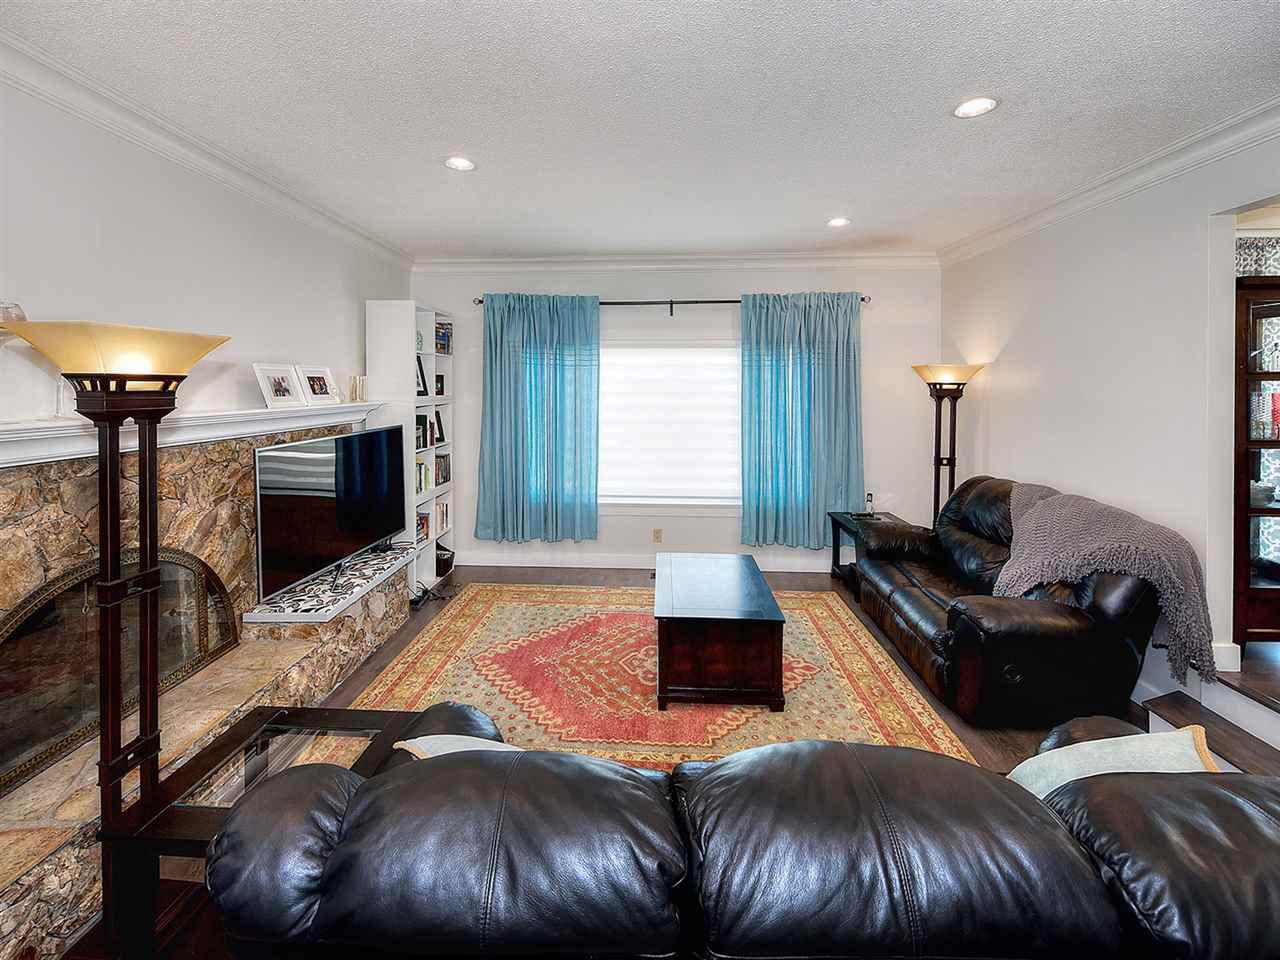 Photo 3: Photos: 1067 WILMINGTON Drive in Delta: Tsawwassen Central House for sale (Tsawwassen)  : MLS®# R2090180